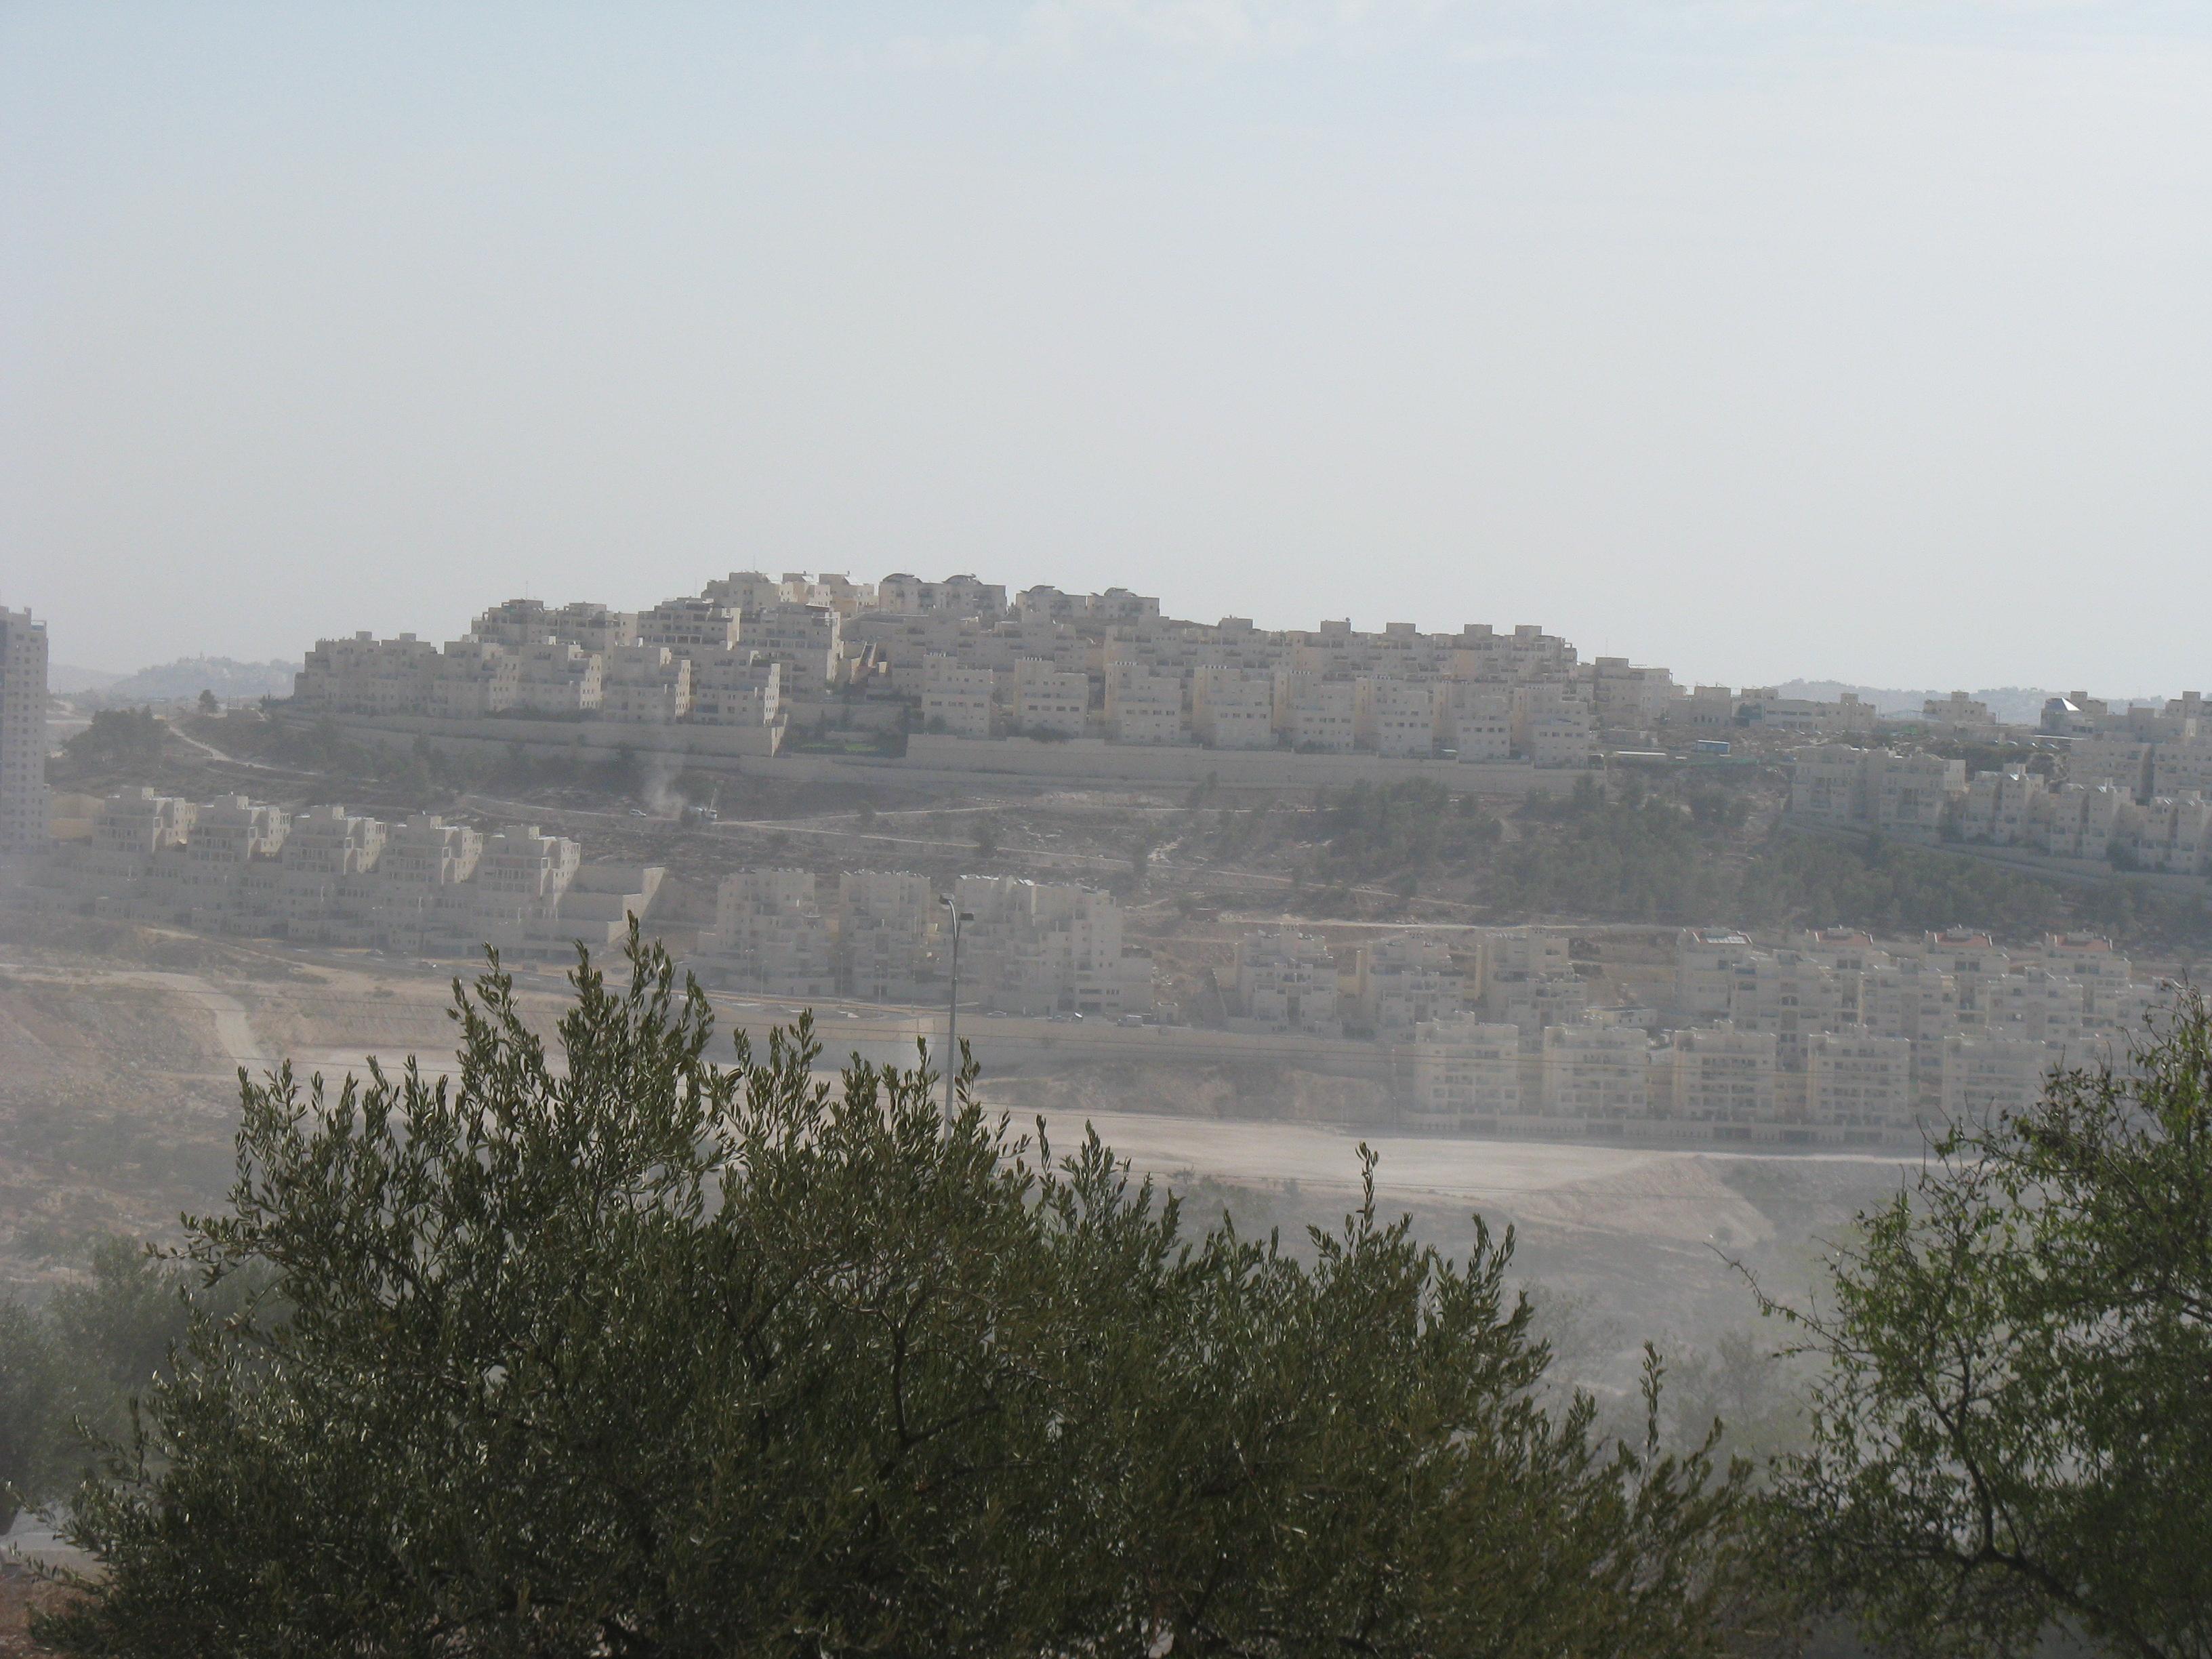 Part of Har Homa, seen from Tantur